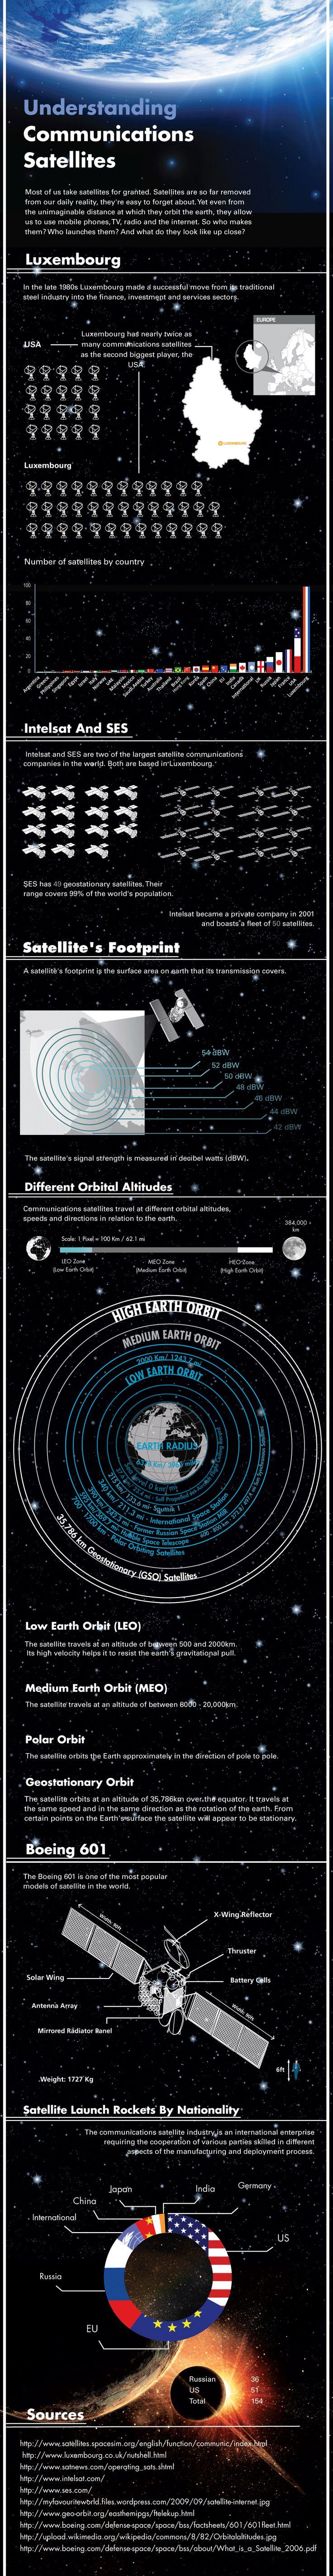 66 best satellite antennas images on pinterest infographic